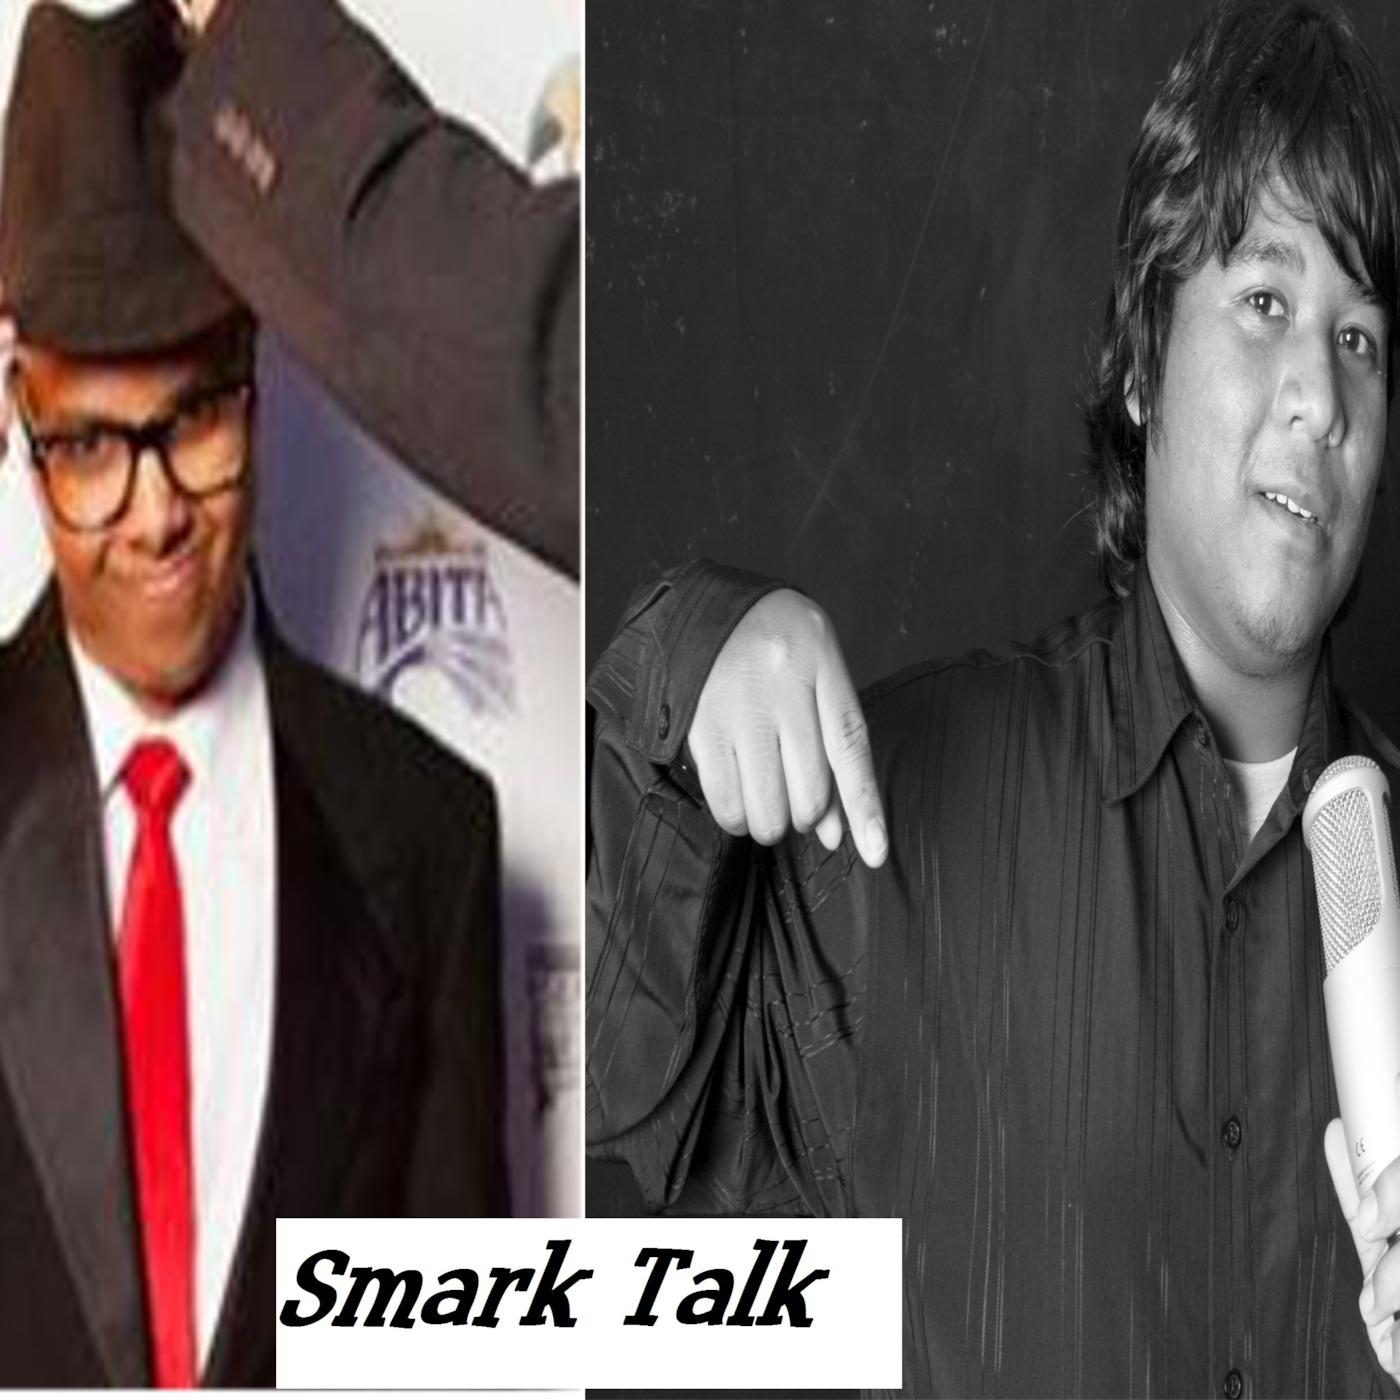 Smark Talk: Fantasy Booking The Divas Division, Reigns' Push